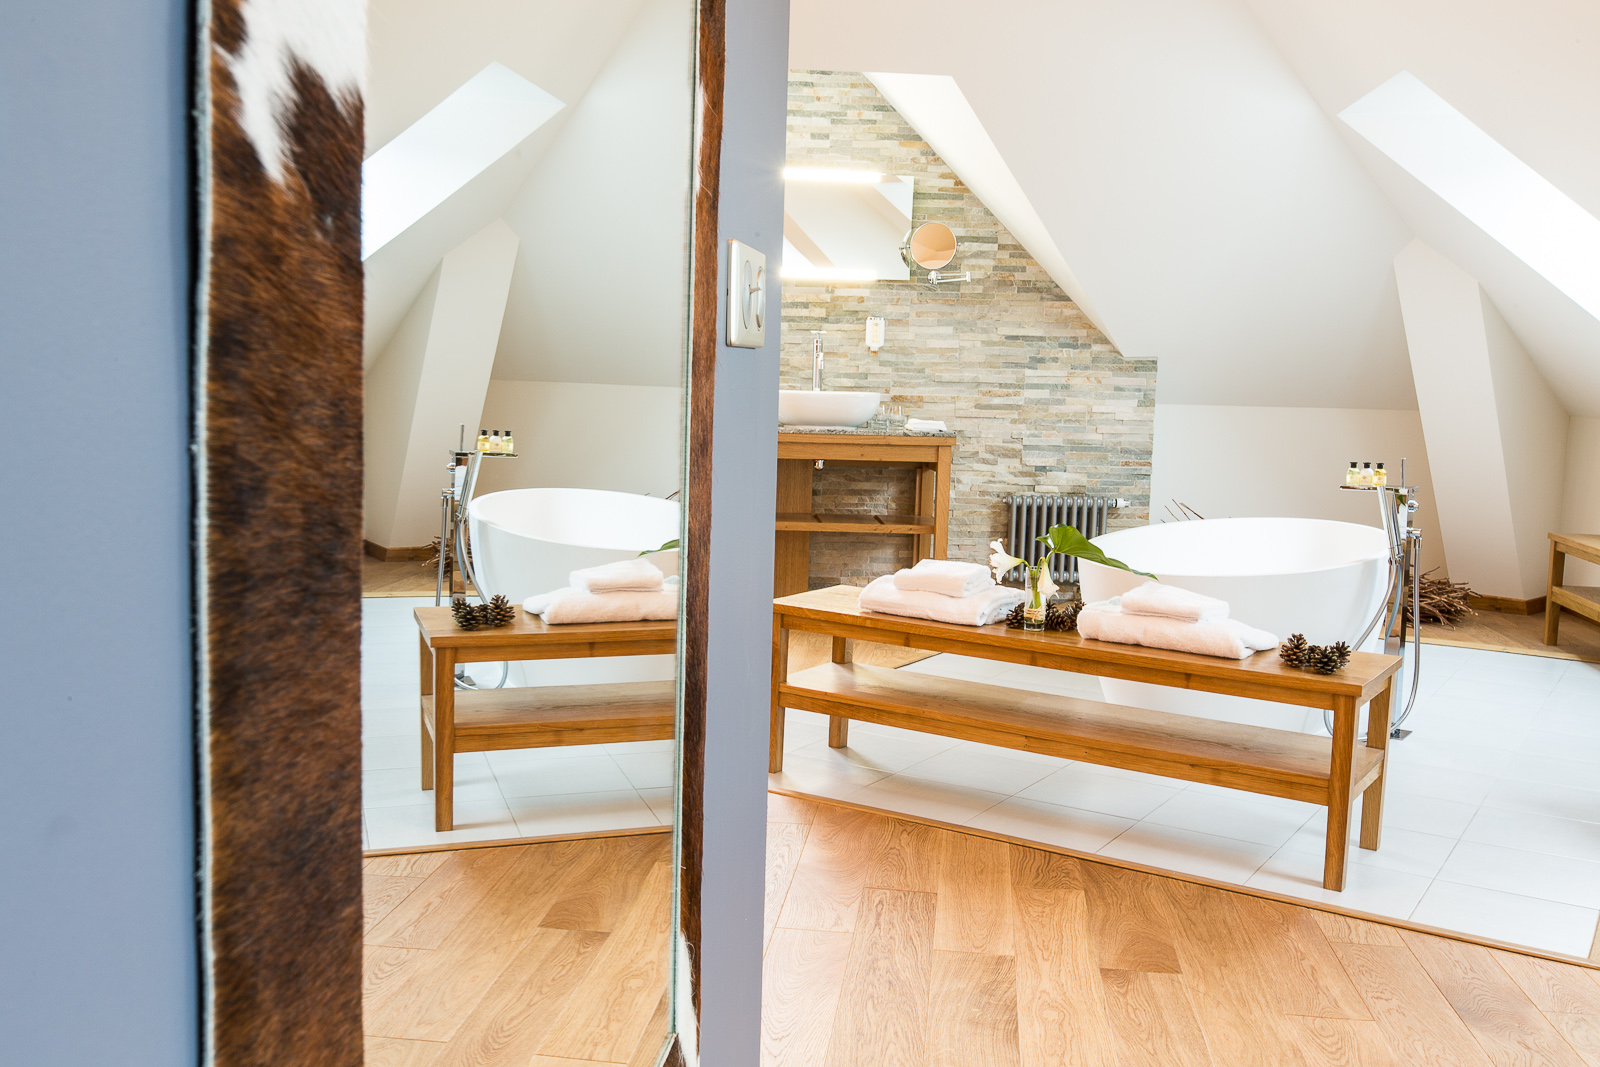 Hotel Marotte chalet salle de bain lumineuse